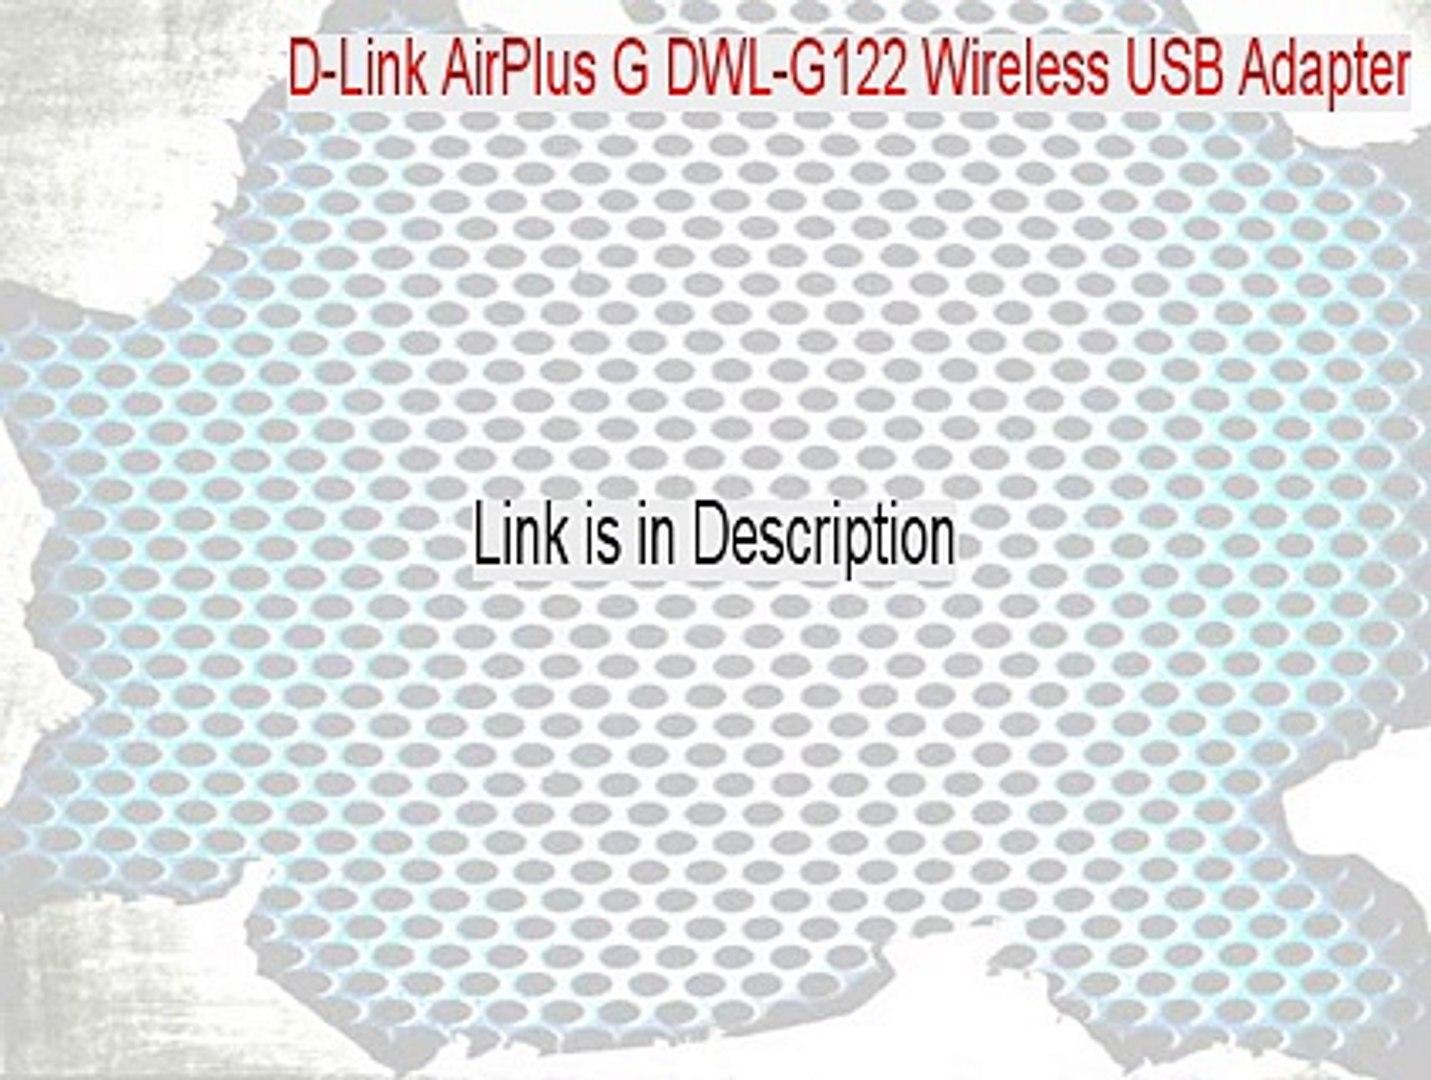 D-LINK DWL-G122 REV A2 DRIVER WINDOWS 7 (2019)